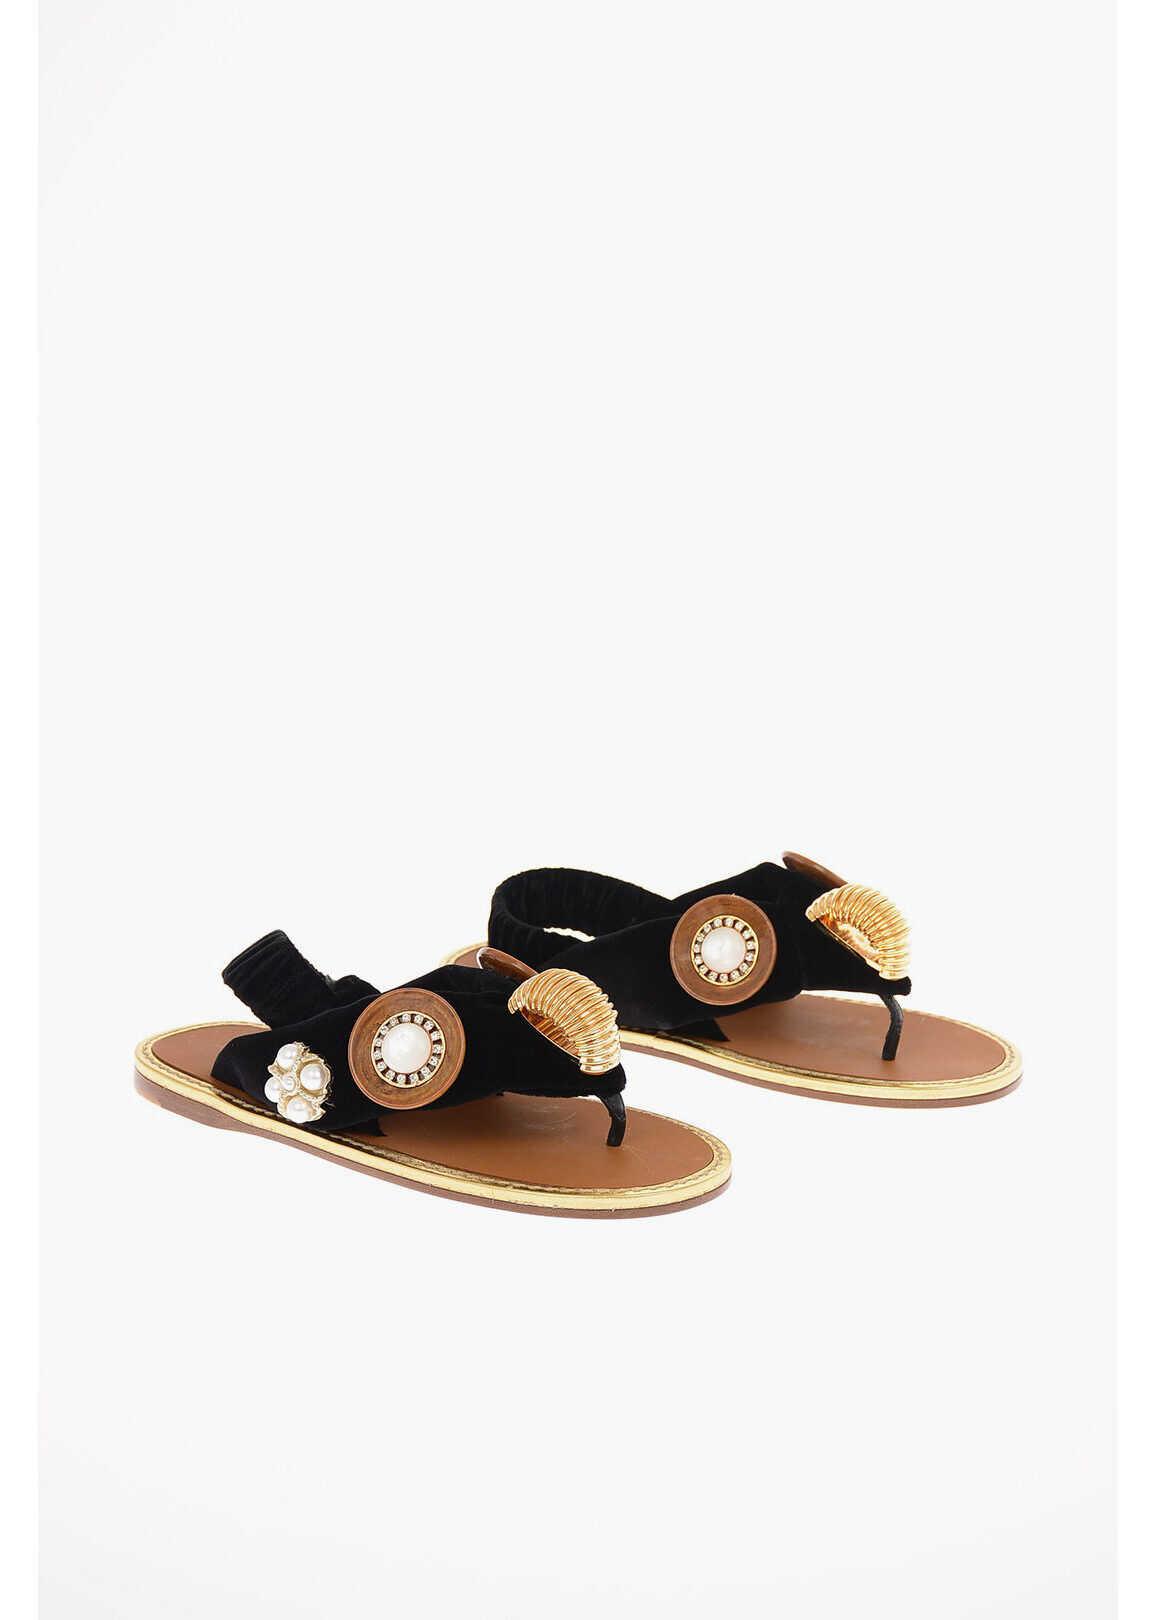 Miu Miu Velvet Thong Sandals with Jewel Applications BLACK imagine b-mall.ro